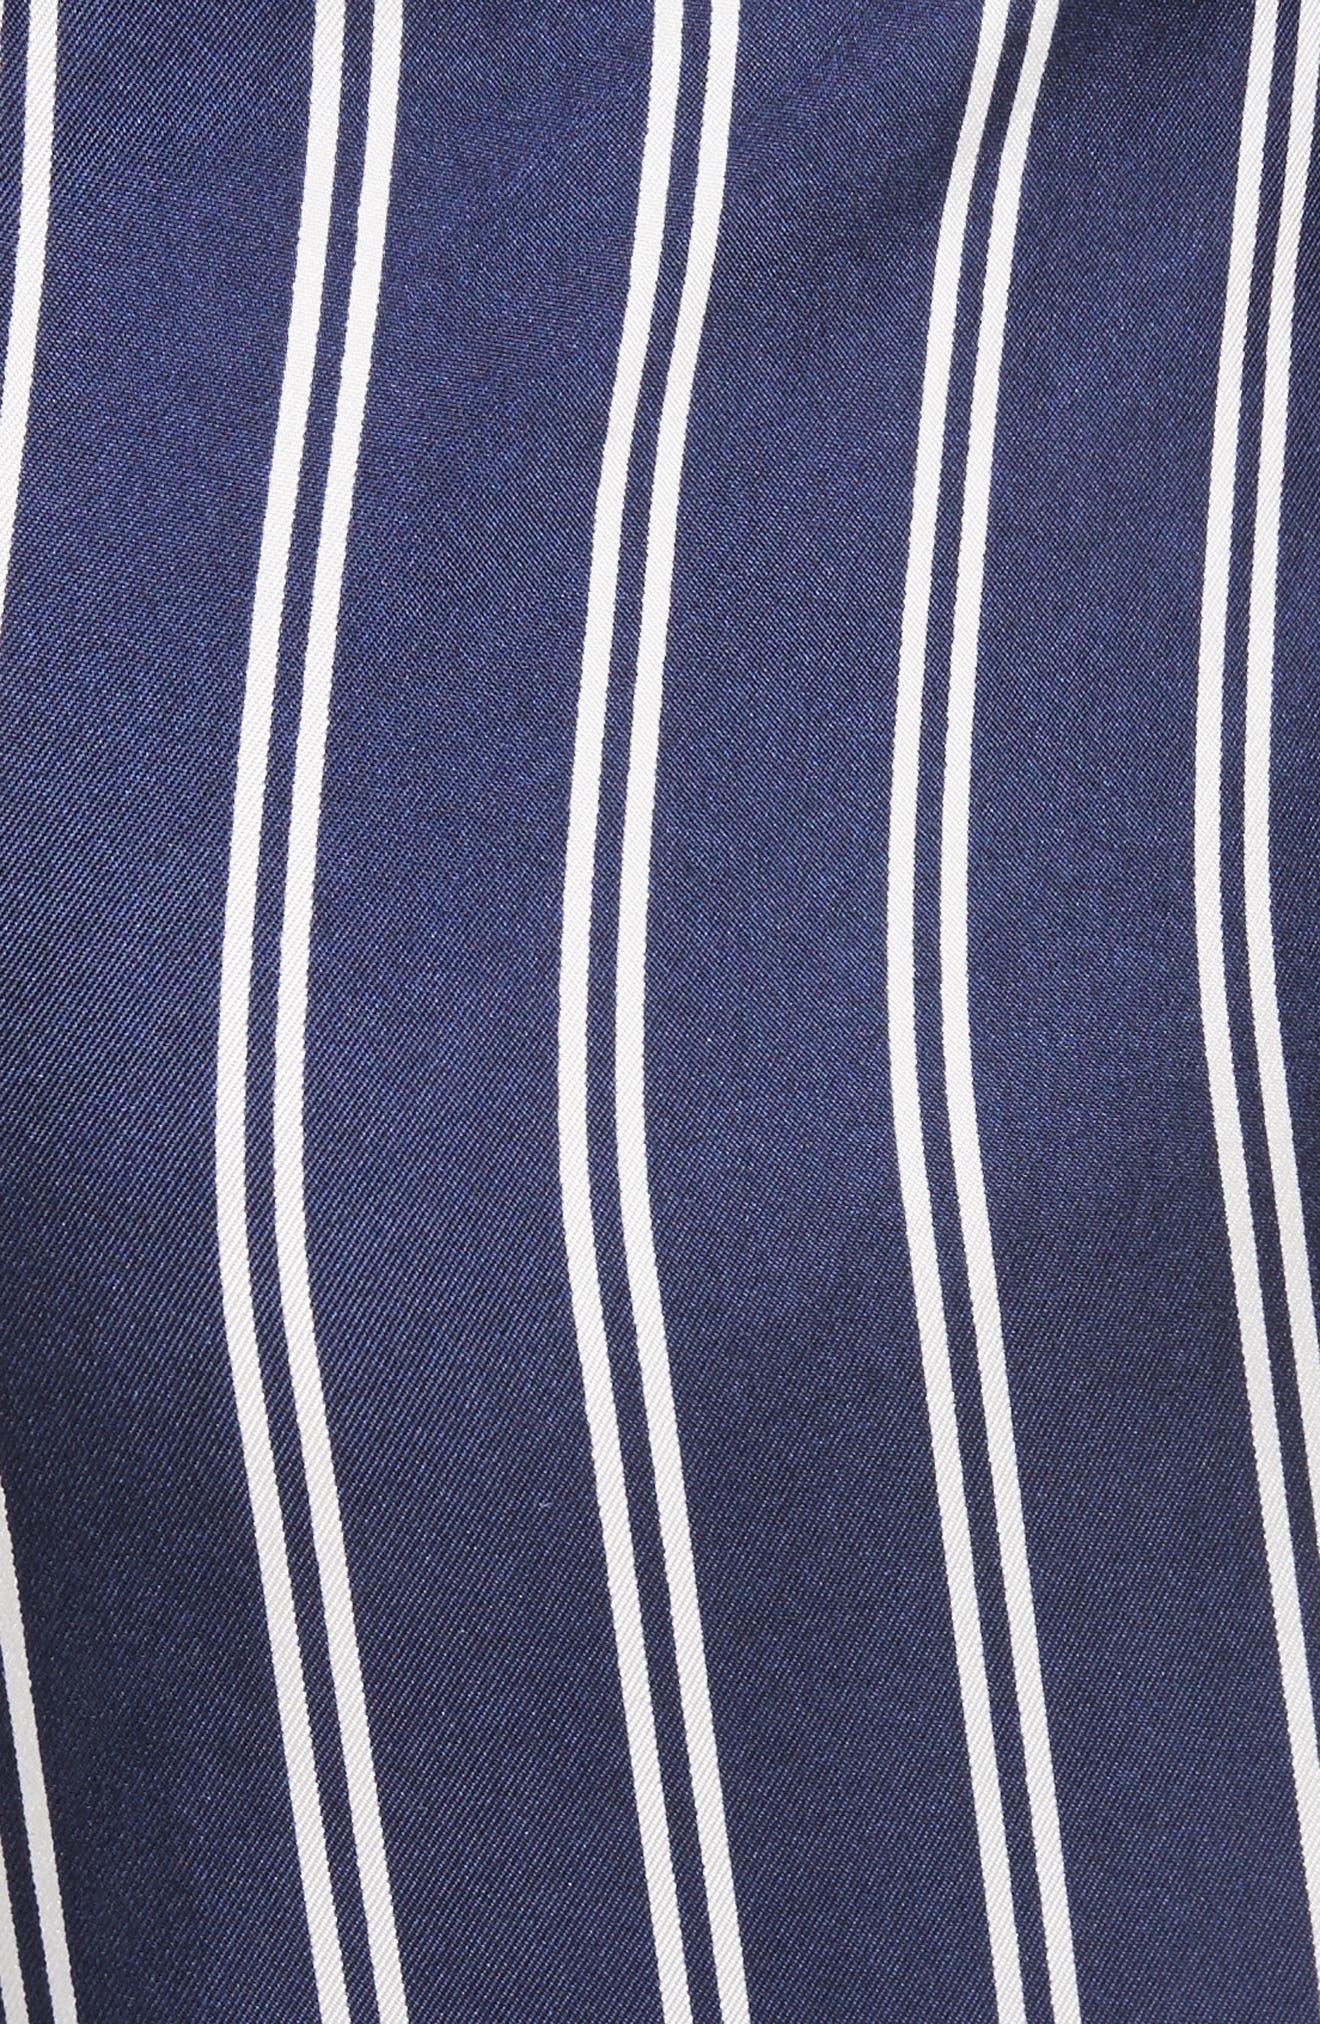 Addiena Stripe Silk Pants,                             Alternate thumbnail 5, color,                             418